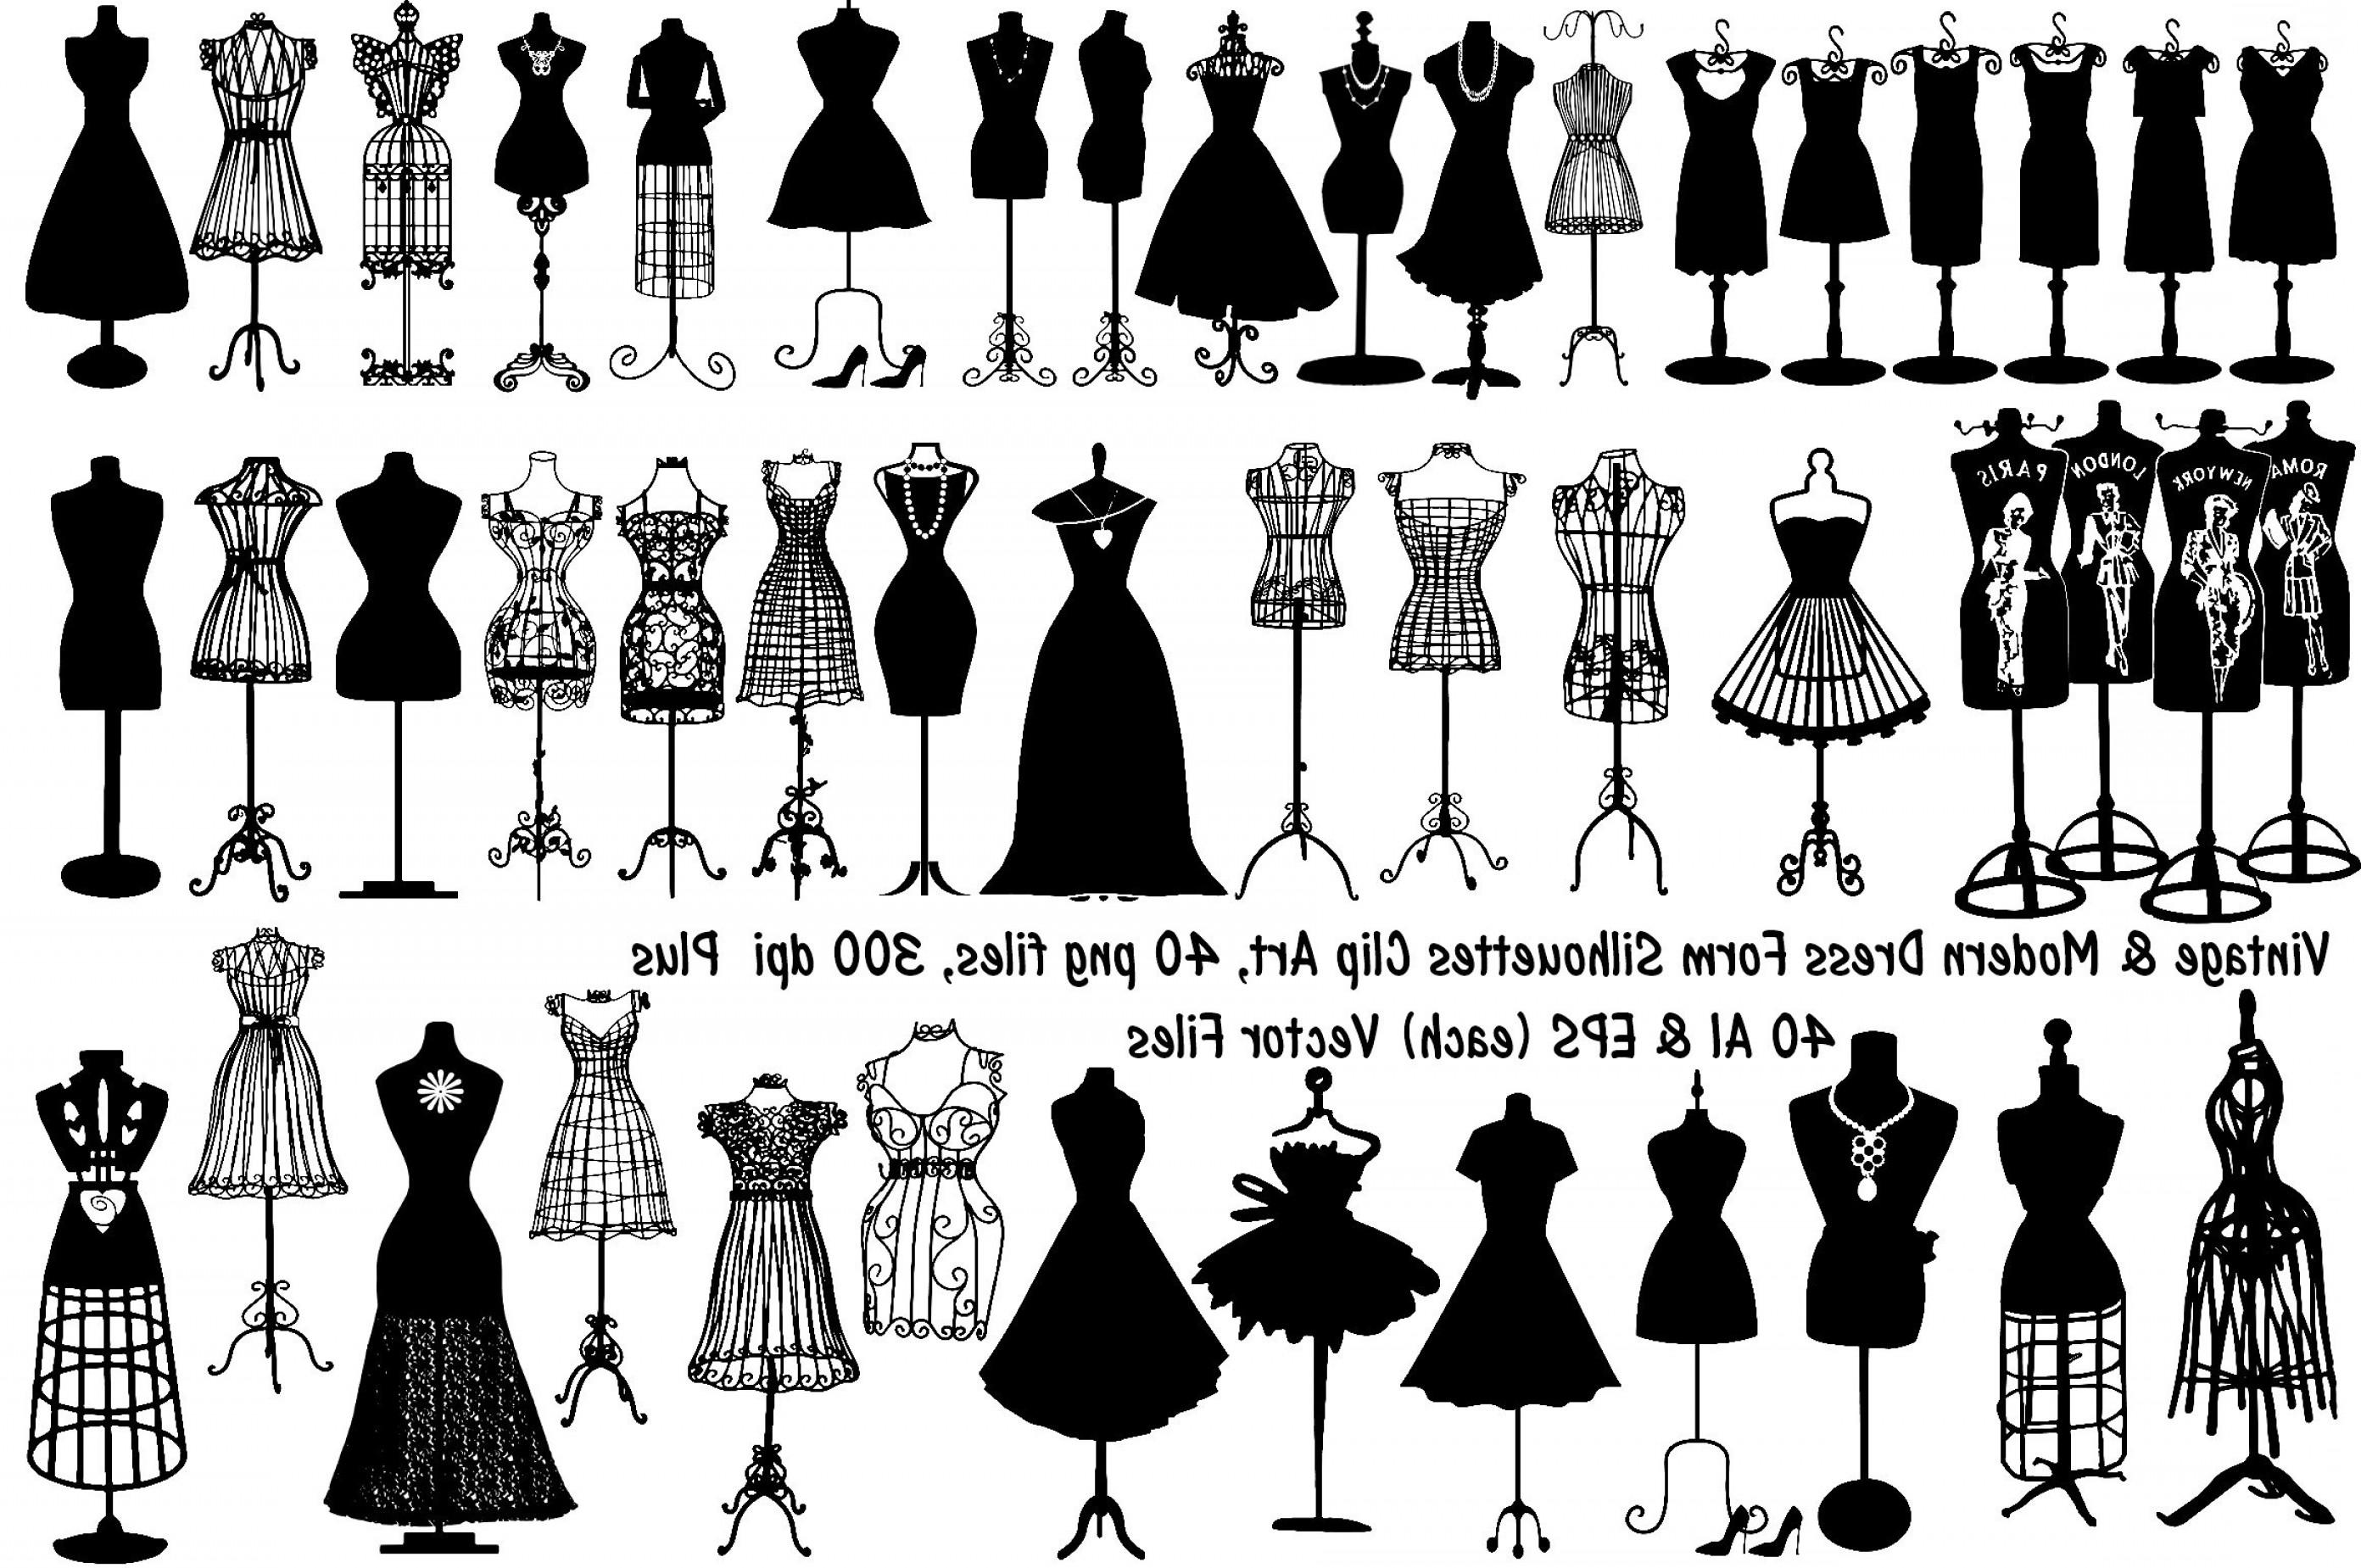 2784x1849 Dress Form Silhouettes Ai Eps Png Shopatcloth